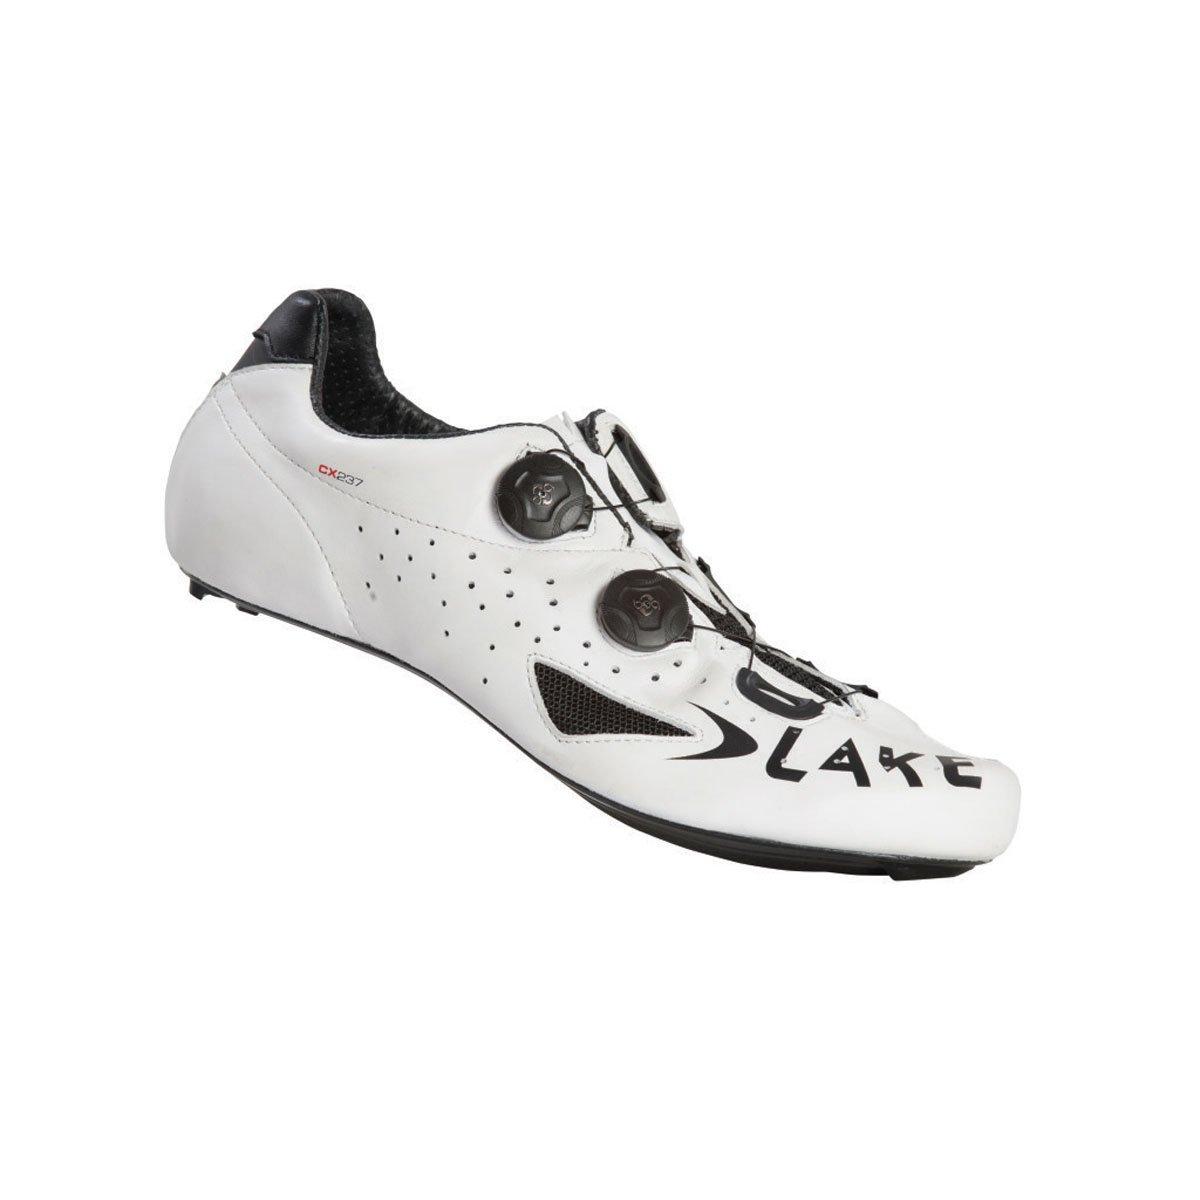 Lake Cycling メンズ カラー: ホワイト B00K7C22PM